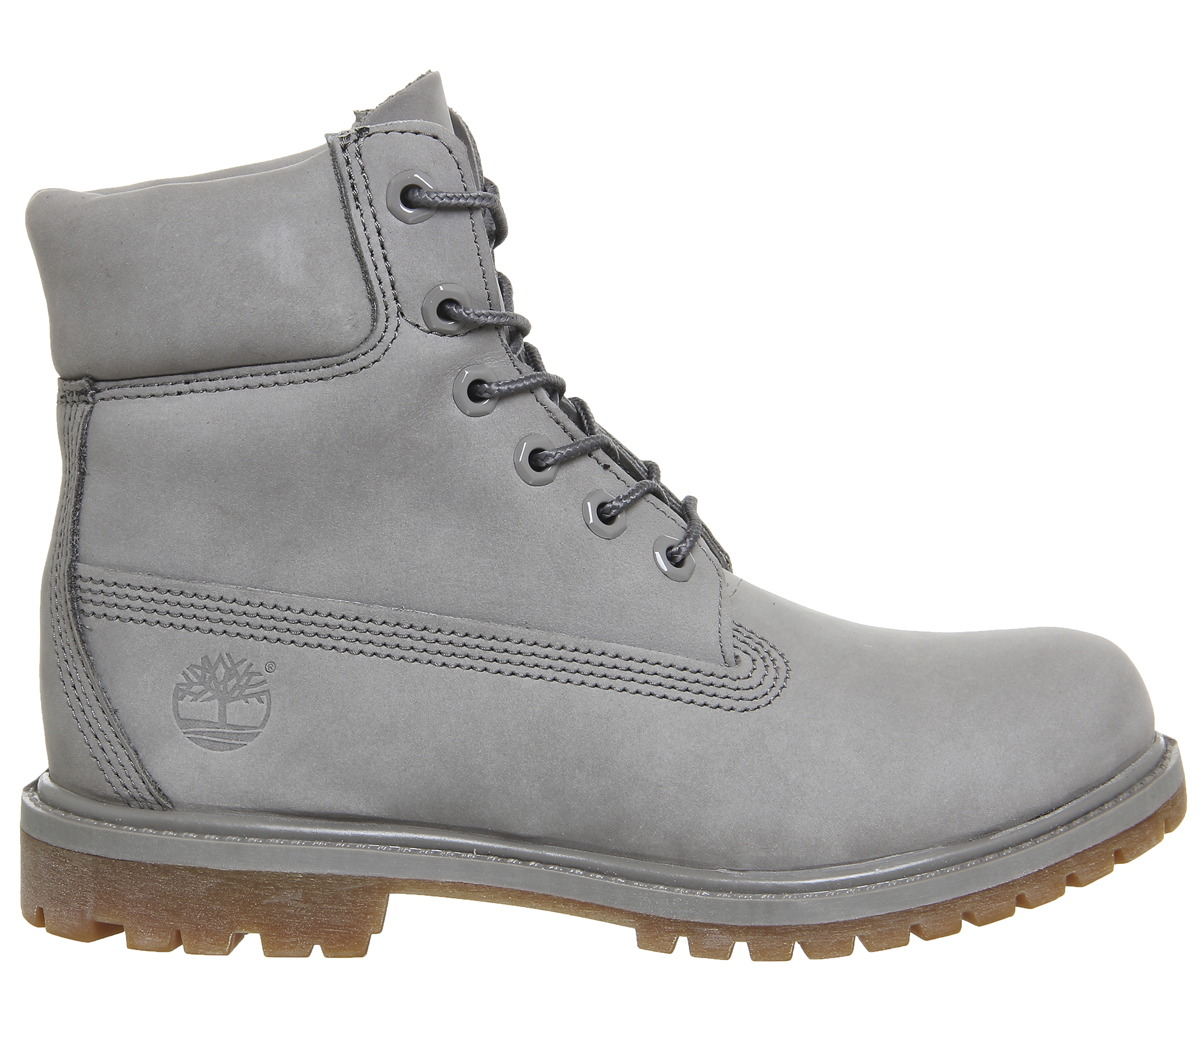 SENTINEL Stivali donna Timberland Premium 6 stivali STEEPLE grigio MONO 783b353dd86